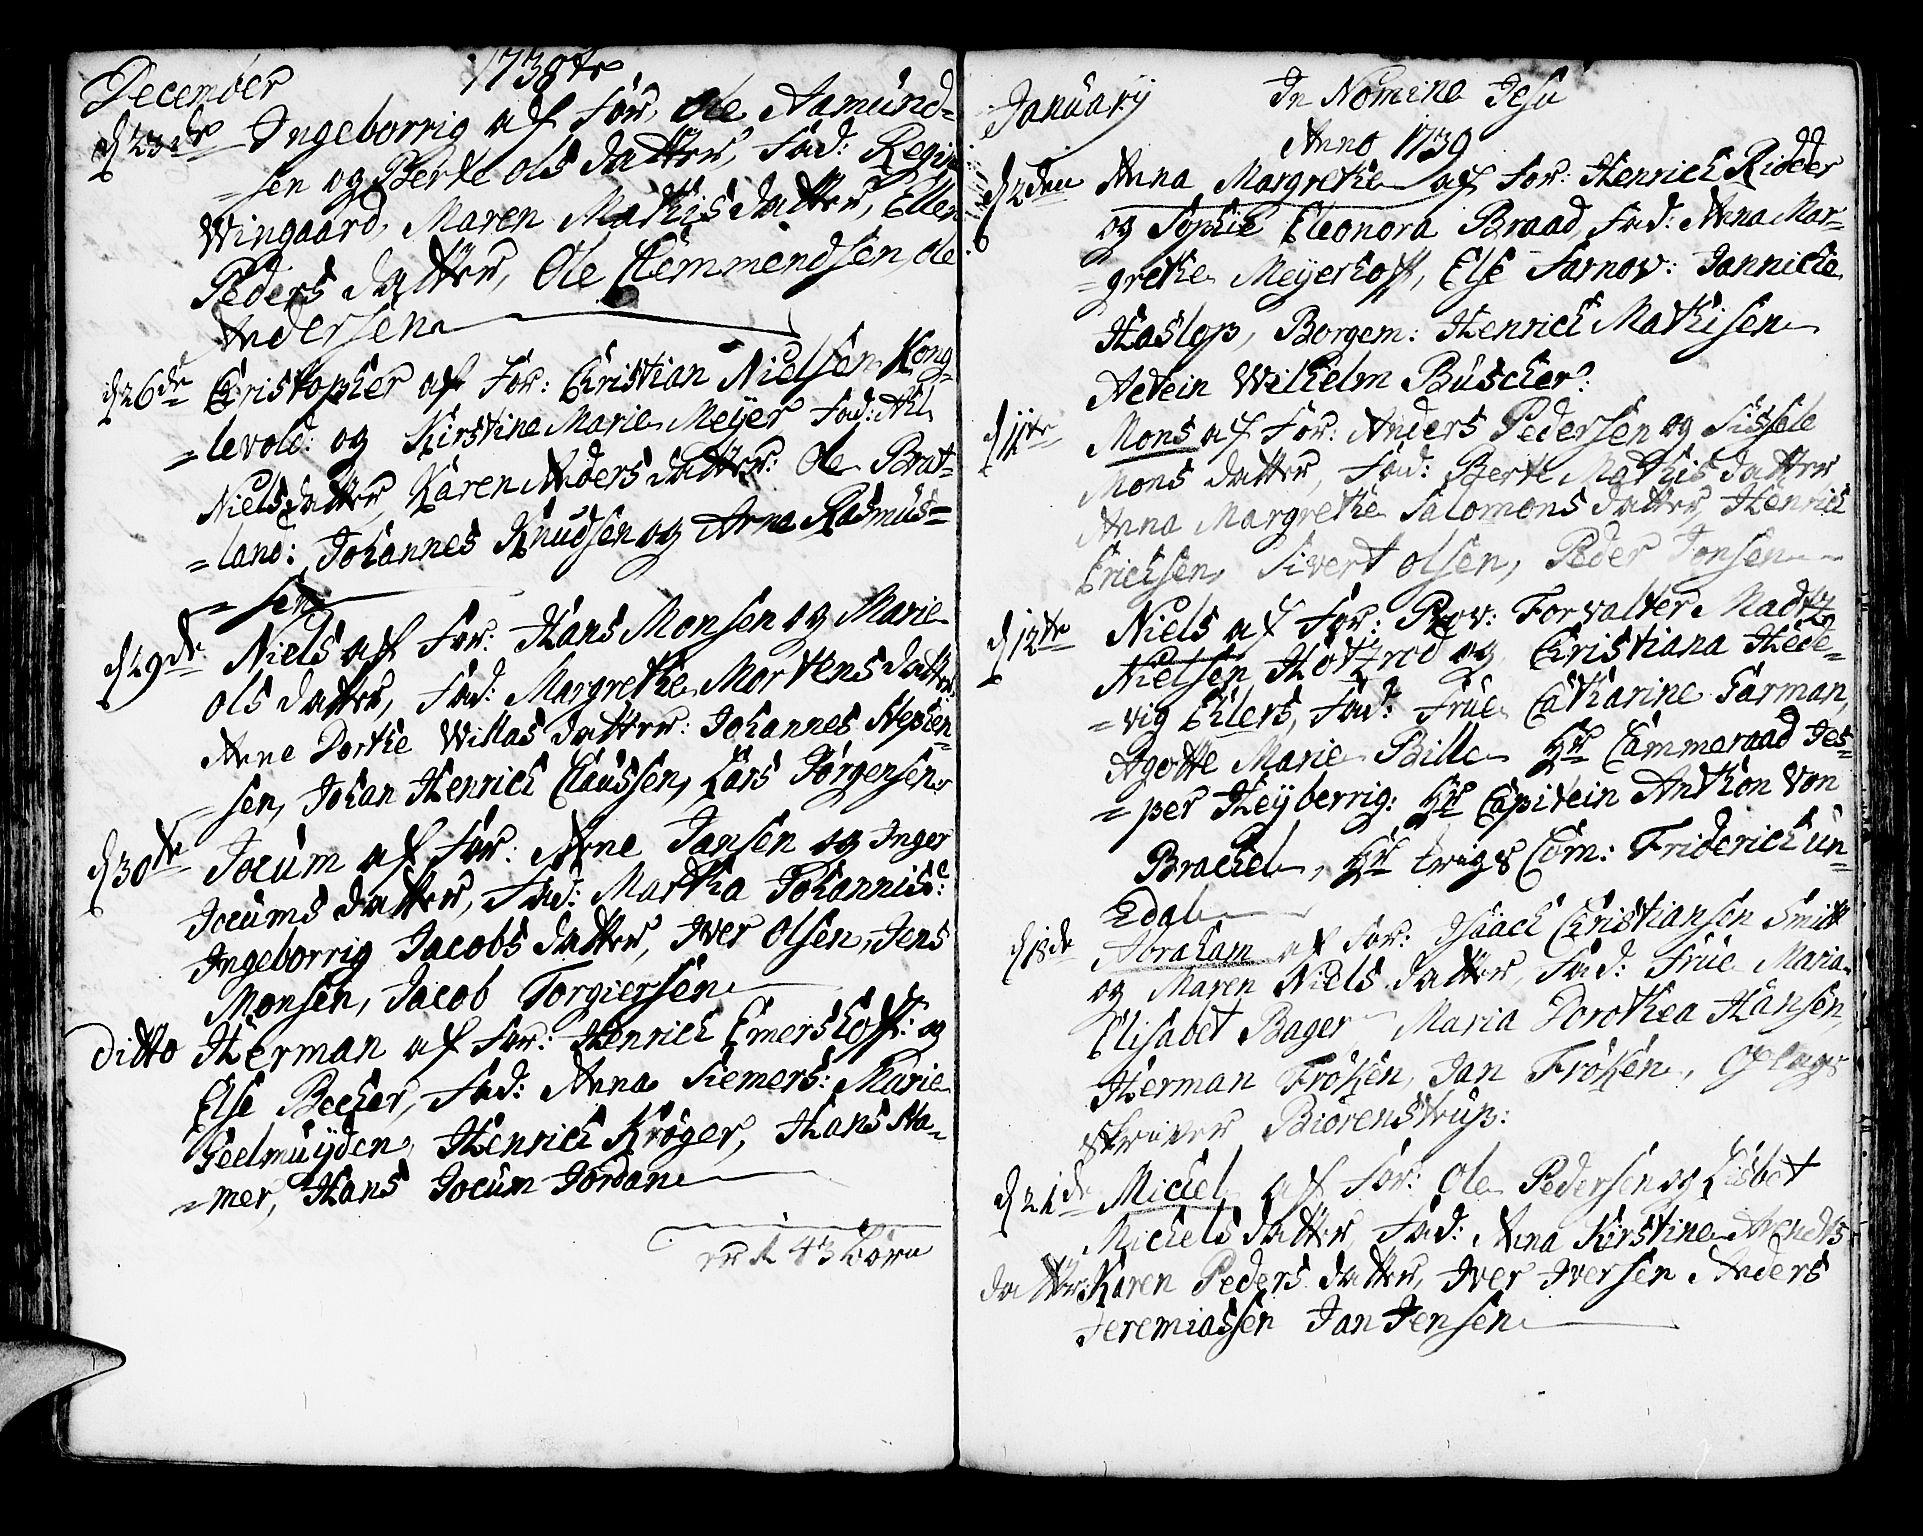 SAB, Korskirken Sokneprestembete, H/Haa/L0004: Ministerialbok nr. A 4, 1720-1750, s. 197